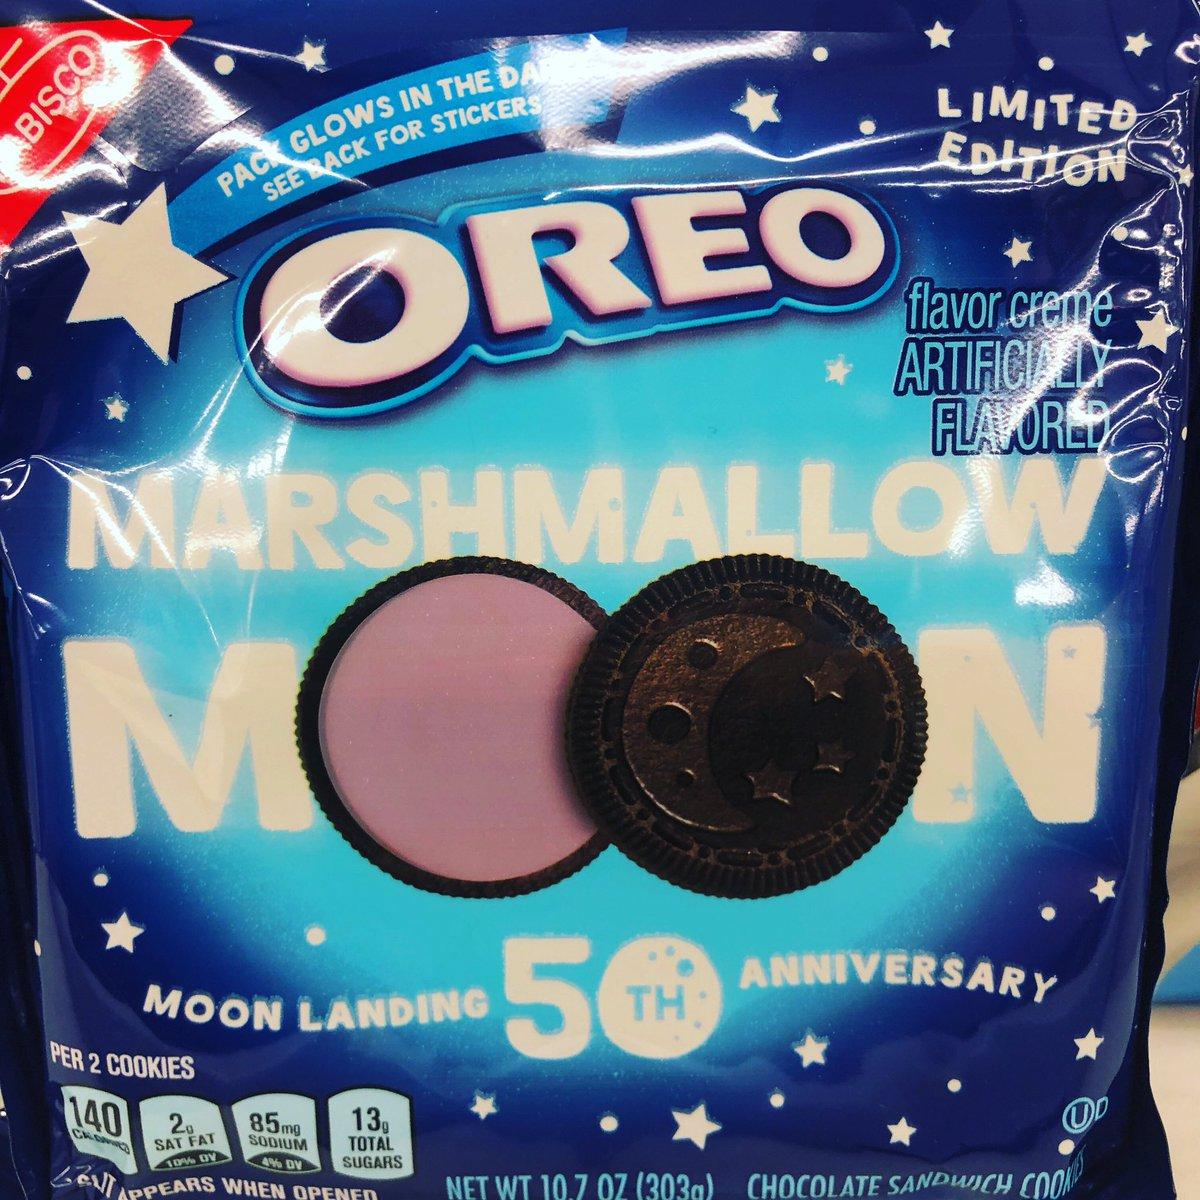 #theconsumer #oreos 50th Anniversary Moon Landing edition. Review: https://www.instagram.com/p/BzB_vJ6Aba0/?igshid=1vz2omisidru8…